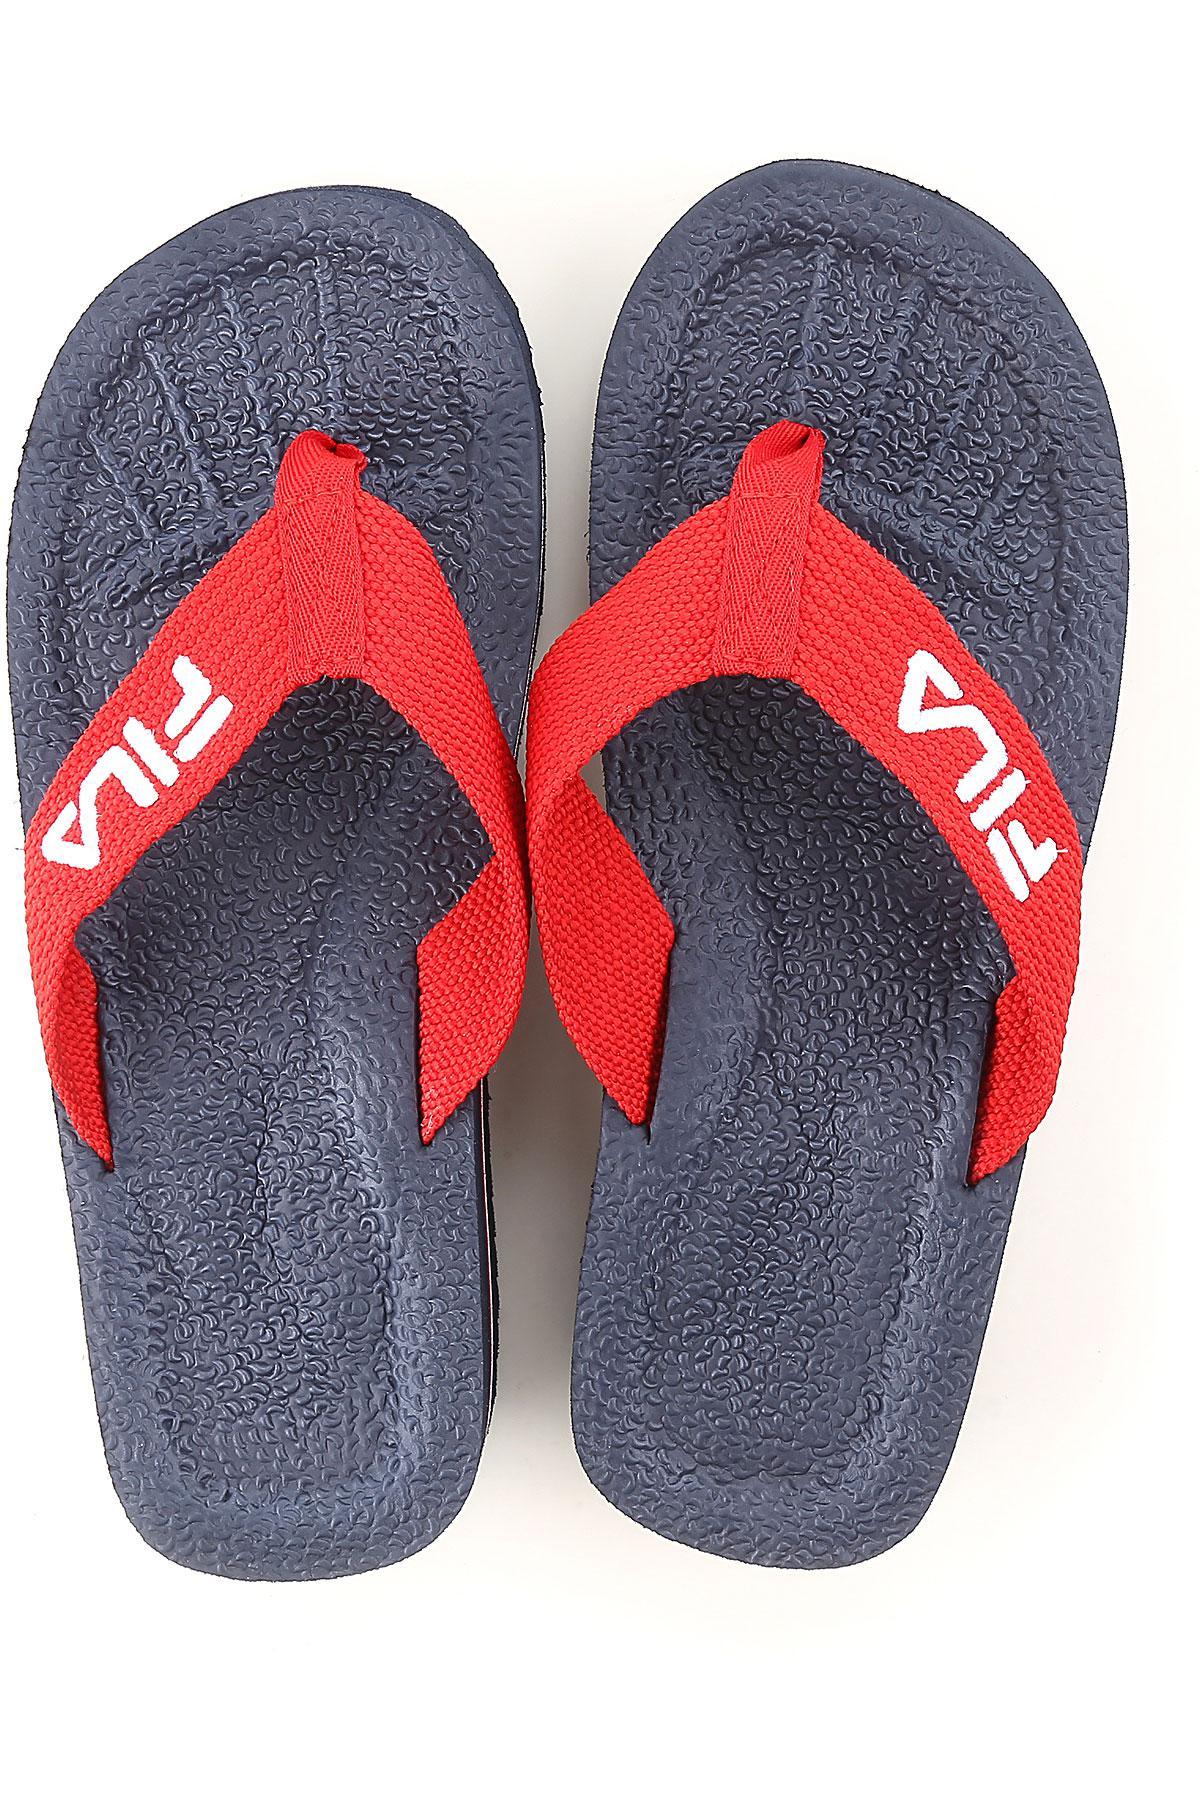 Fila Shoes For Men in Red for Men